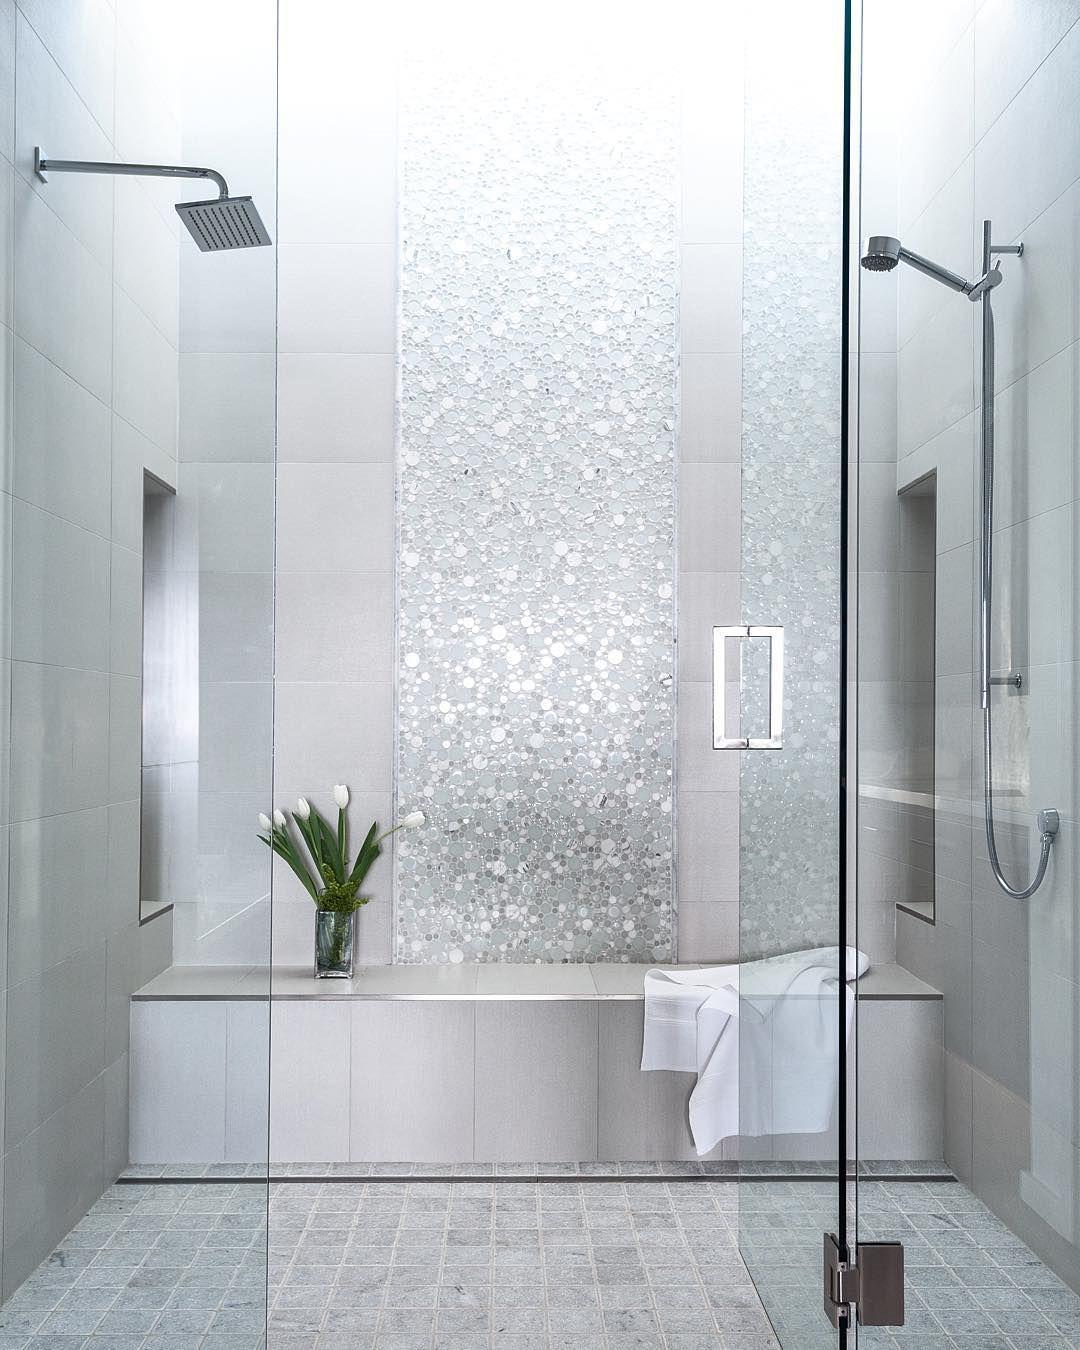 Bathroom Tiles Mosaic Border procelanosa cubica blanco or pamesa capua wall tile in bathroom